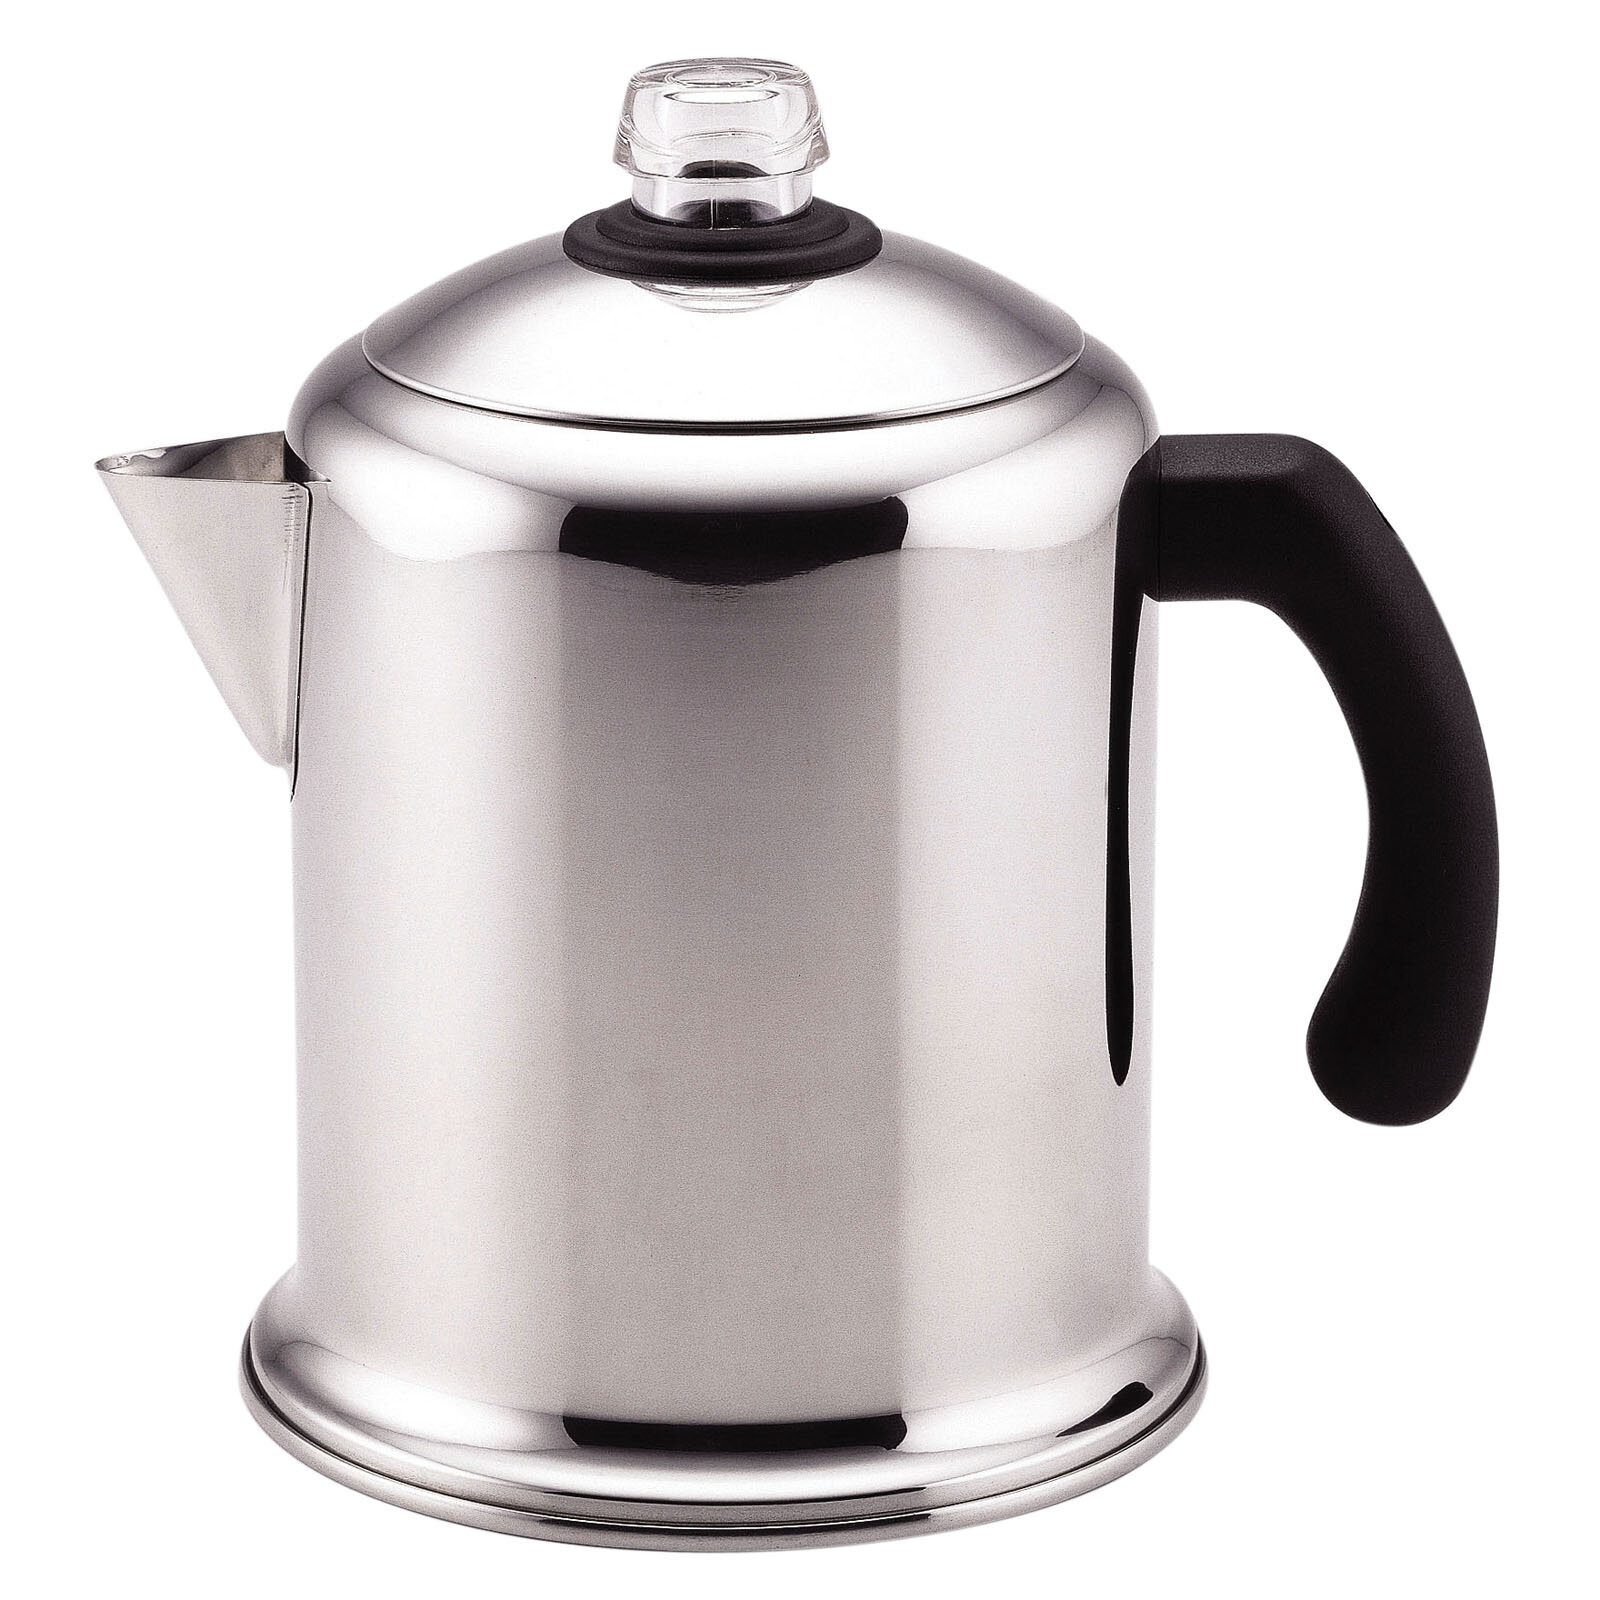 8 Cup+Classic+Yosemite+Percolator farberware 8 cup classic yosemite percolator & reviews wayfair